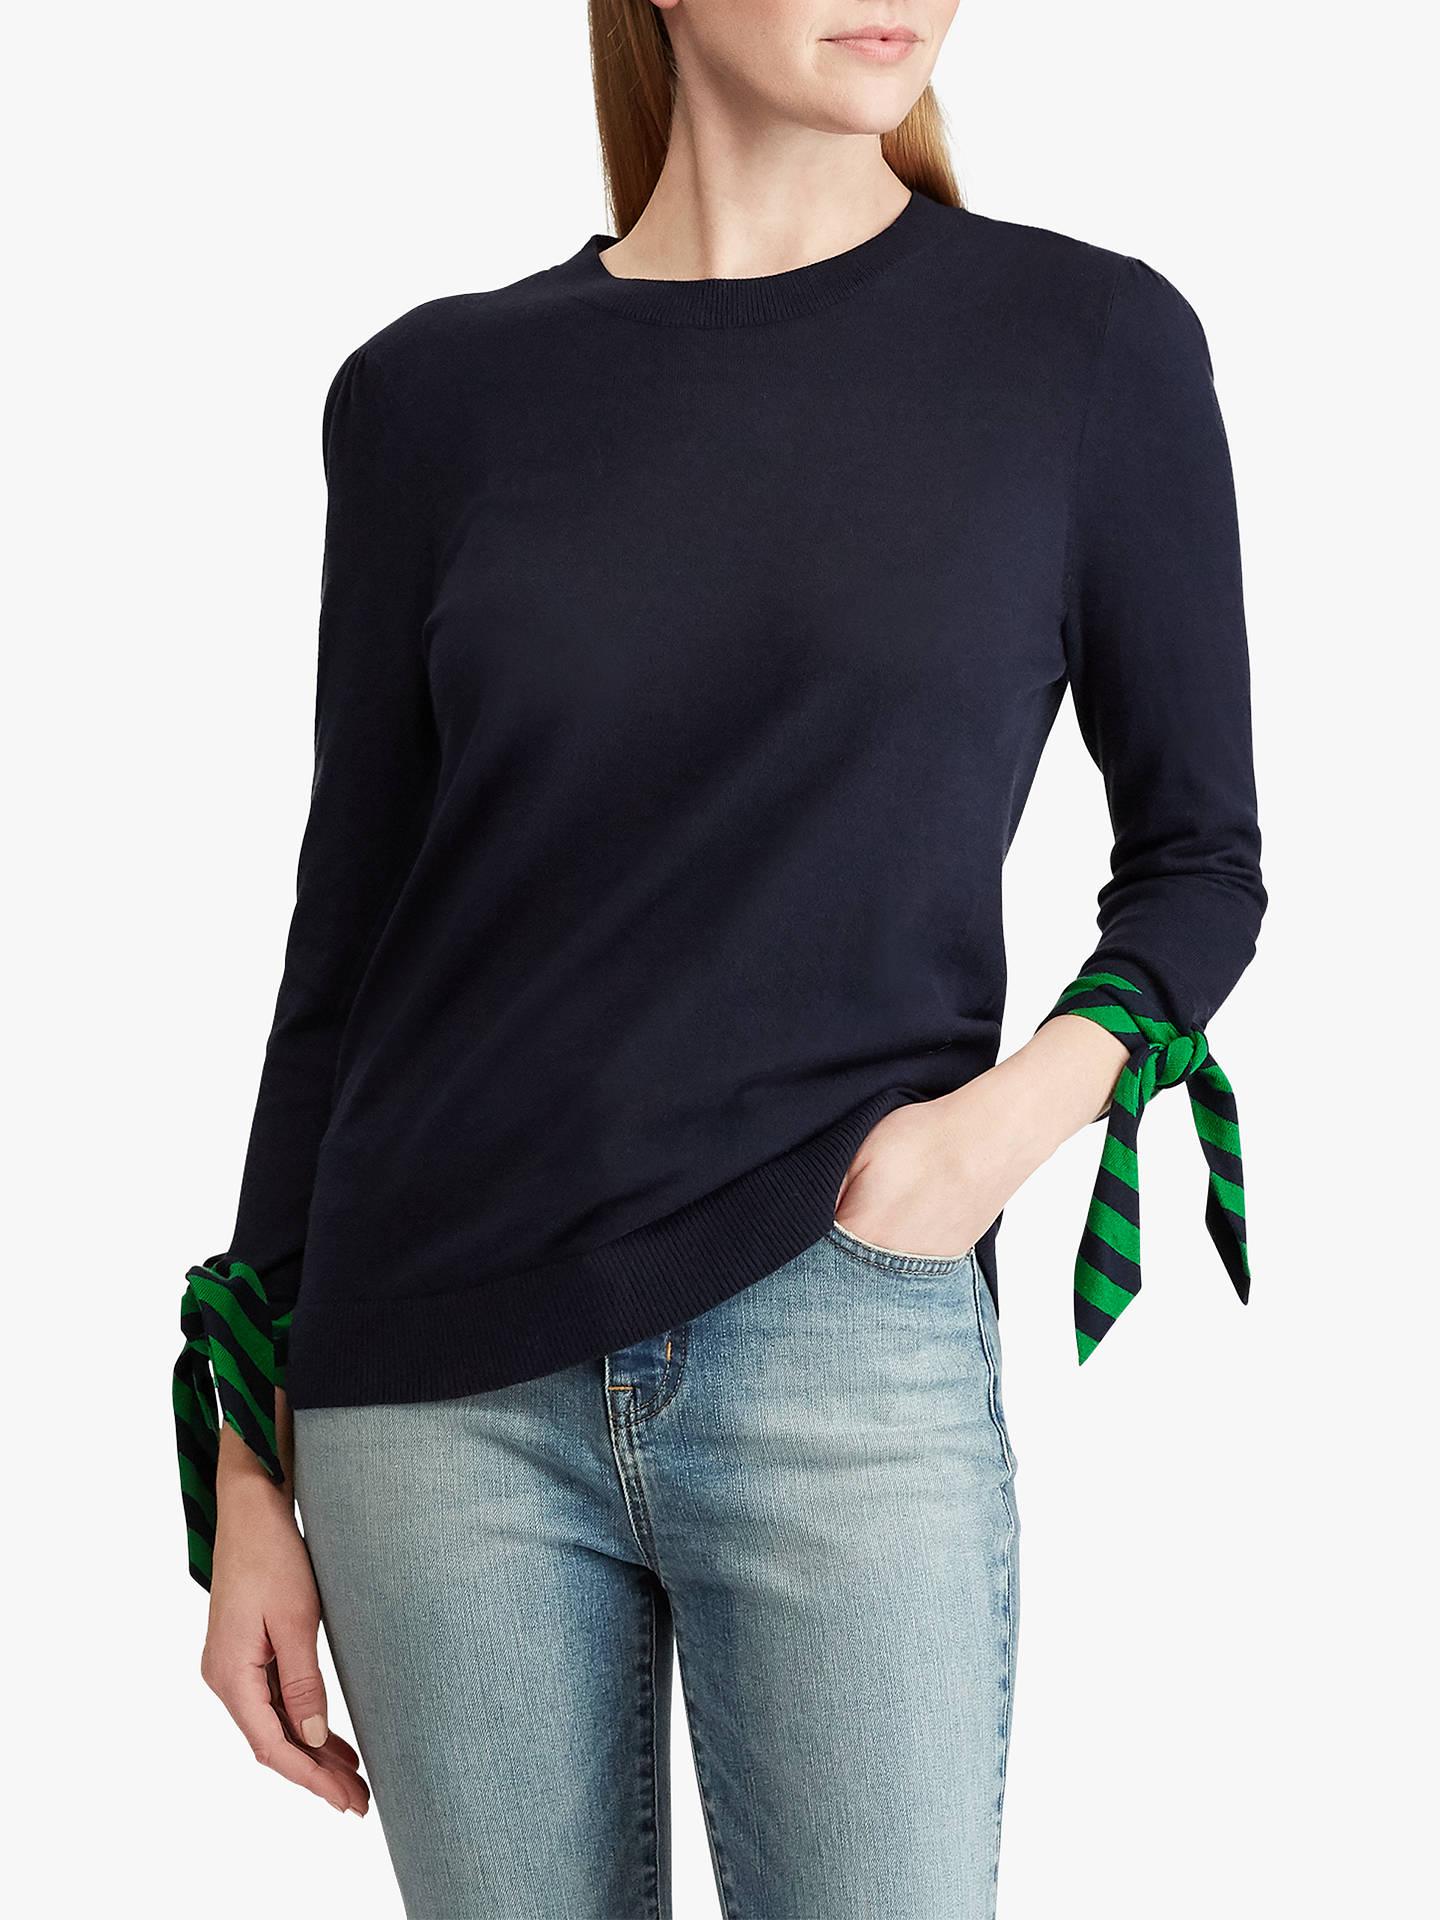 BuyLauren Ralph Lauren Sumati Tie Sleeve Jumper 3e961f393aa